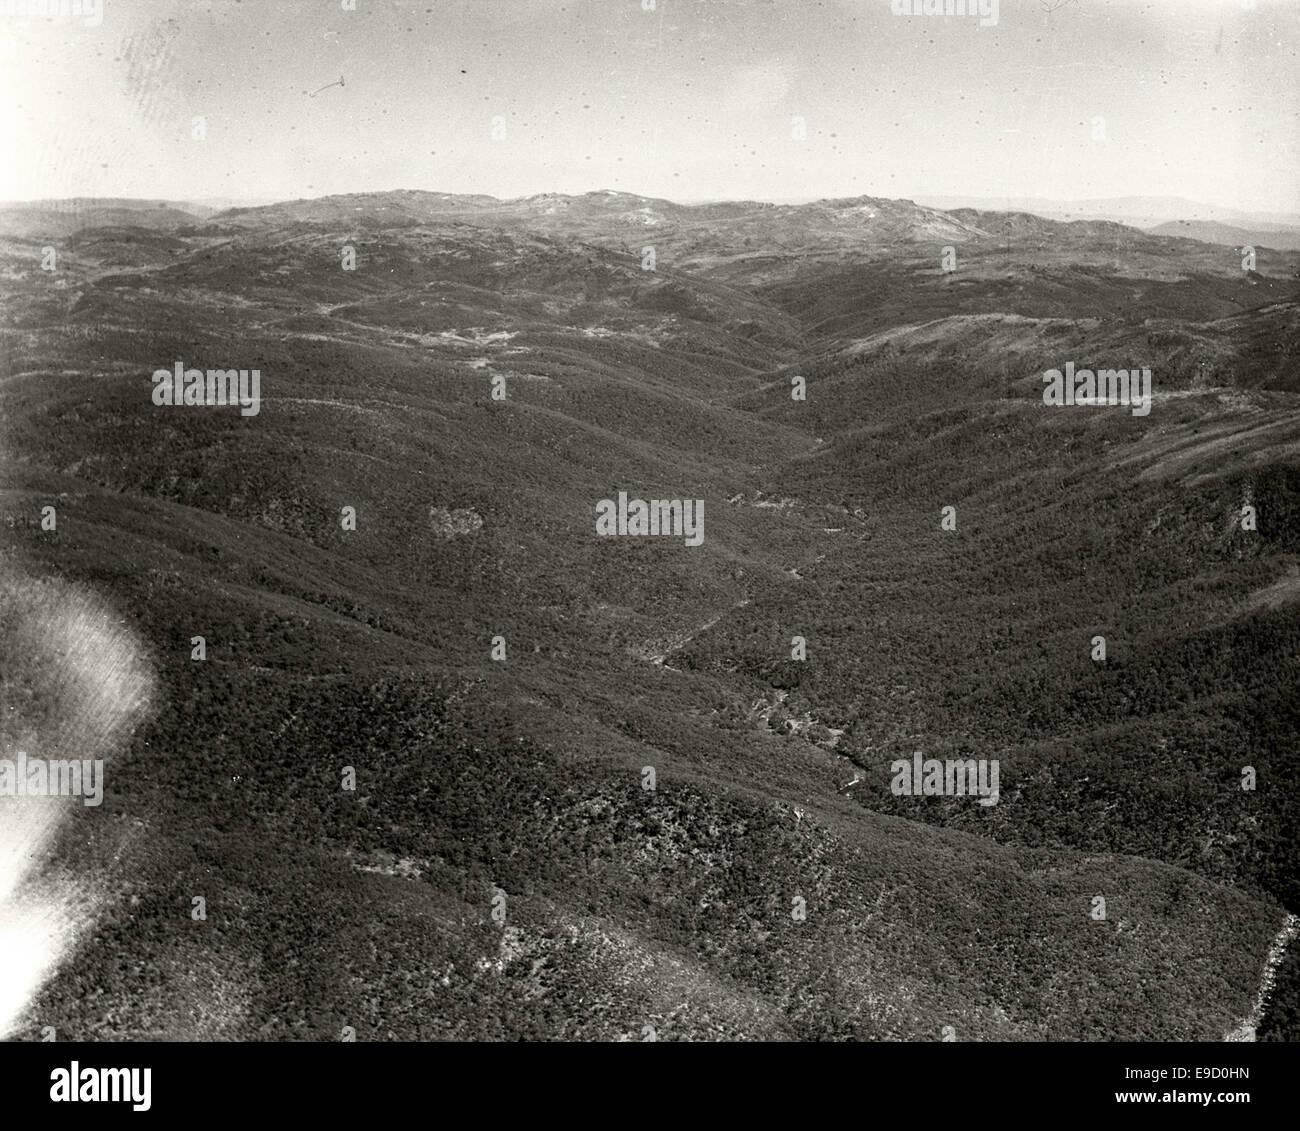 Kosciusko Summit and Snowy River Gorge 14062905263 o - Stock Image